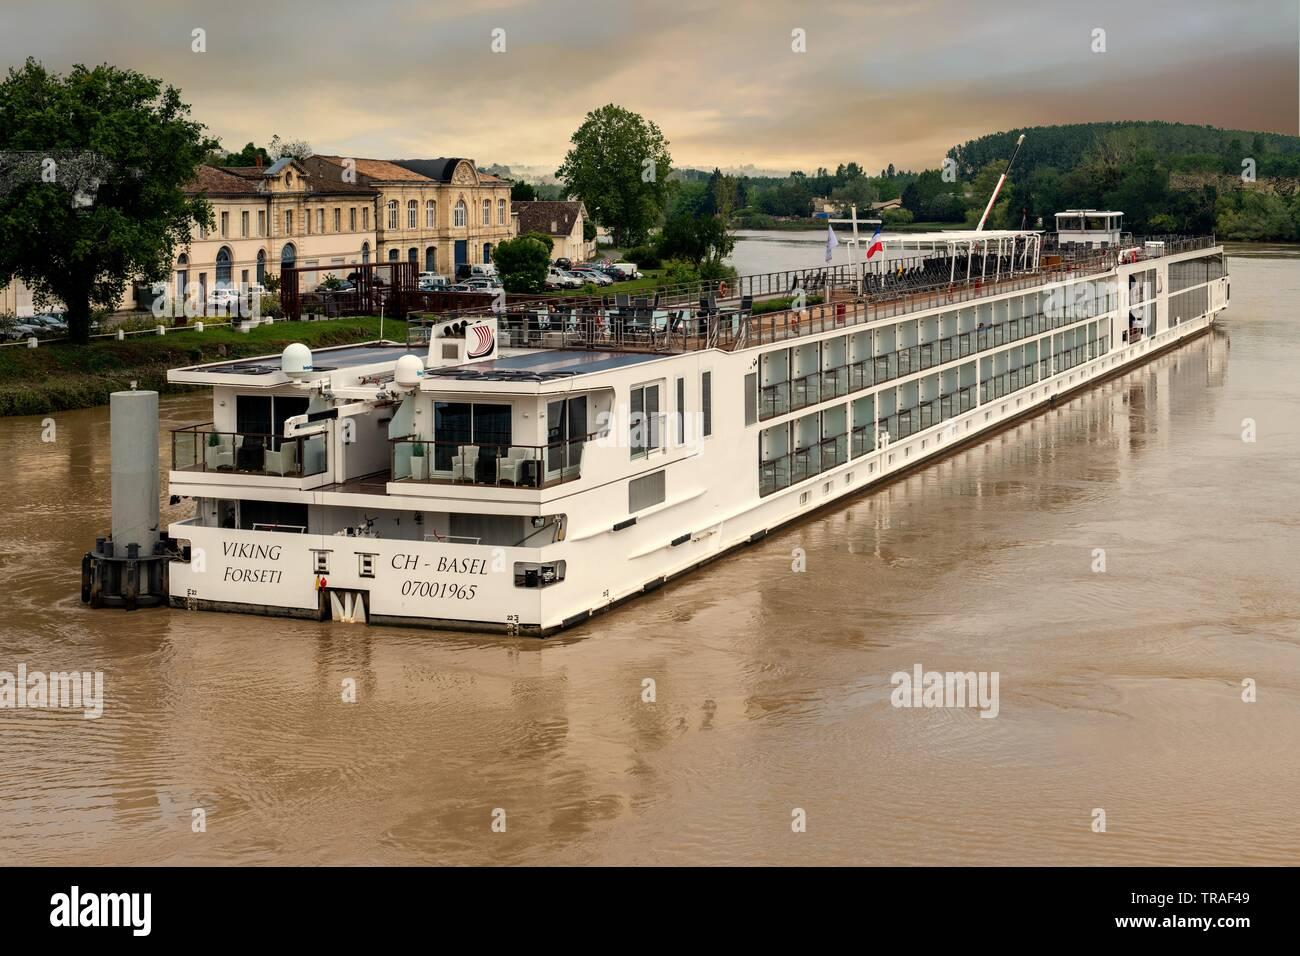 Viking Longship Forseti in Bordeaux region of France - Stock Image